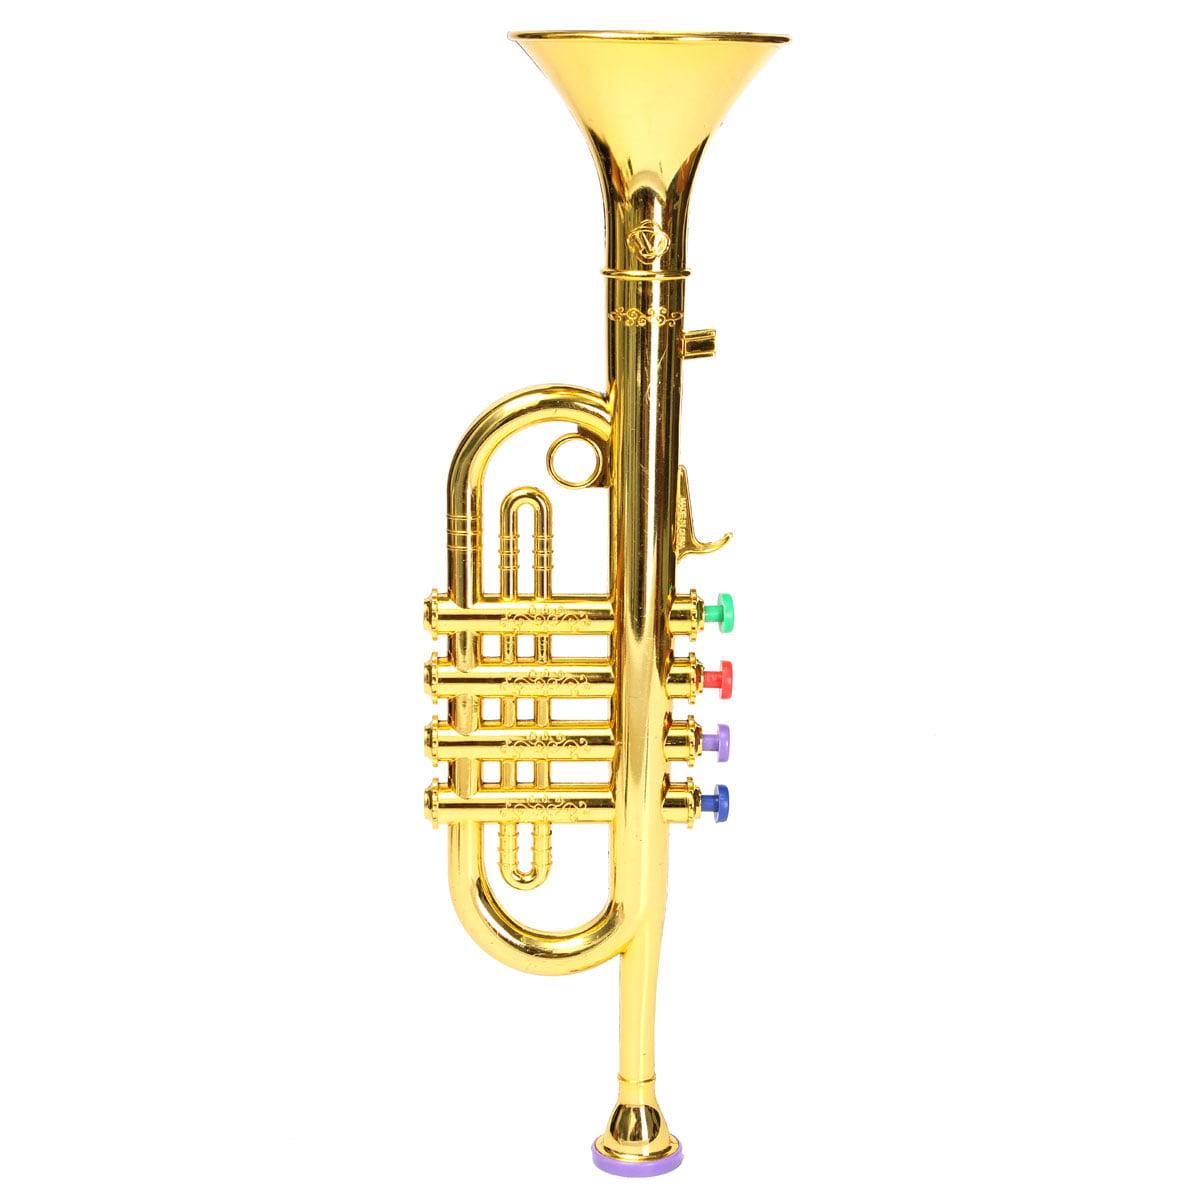 Golden / Silver Plastic Mini Horn Trumpet Musical Music Instrument ...